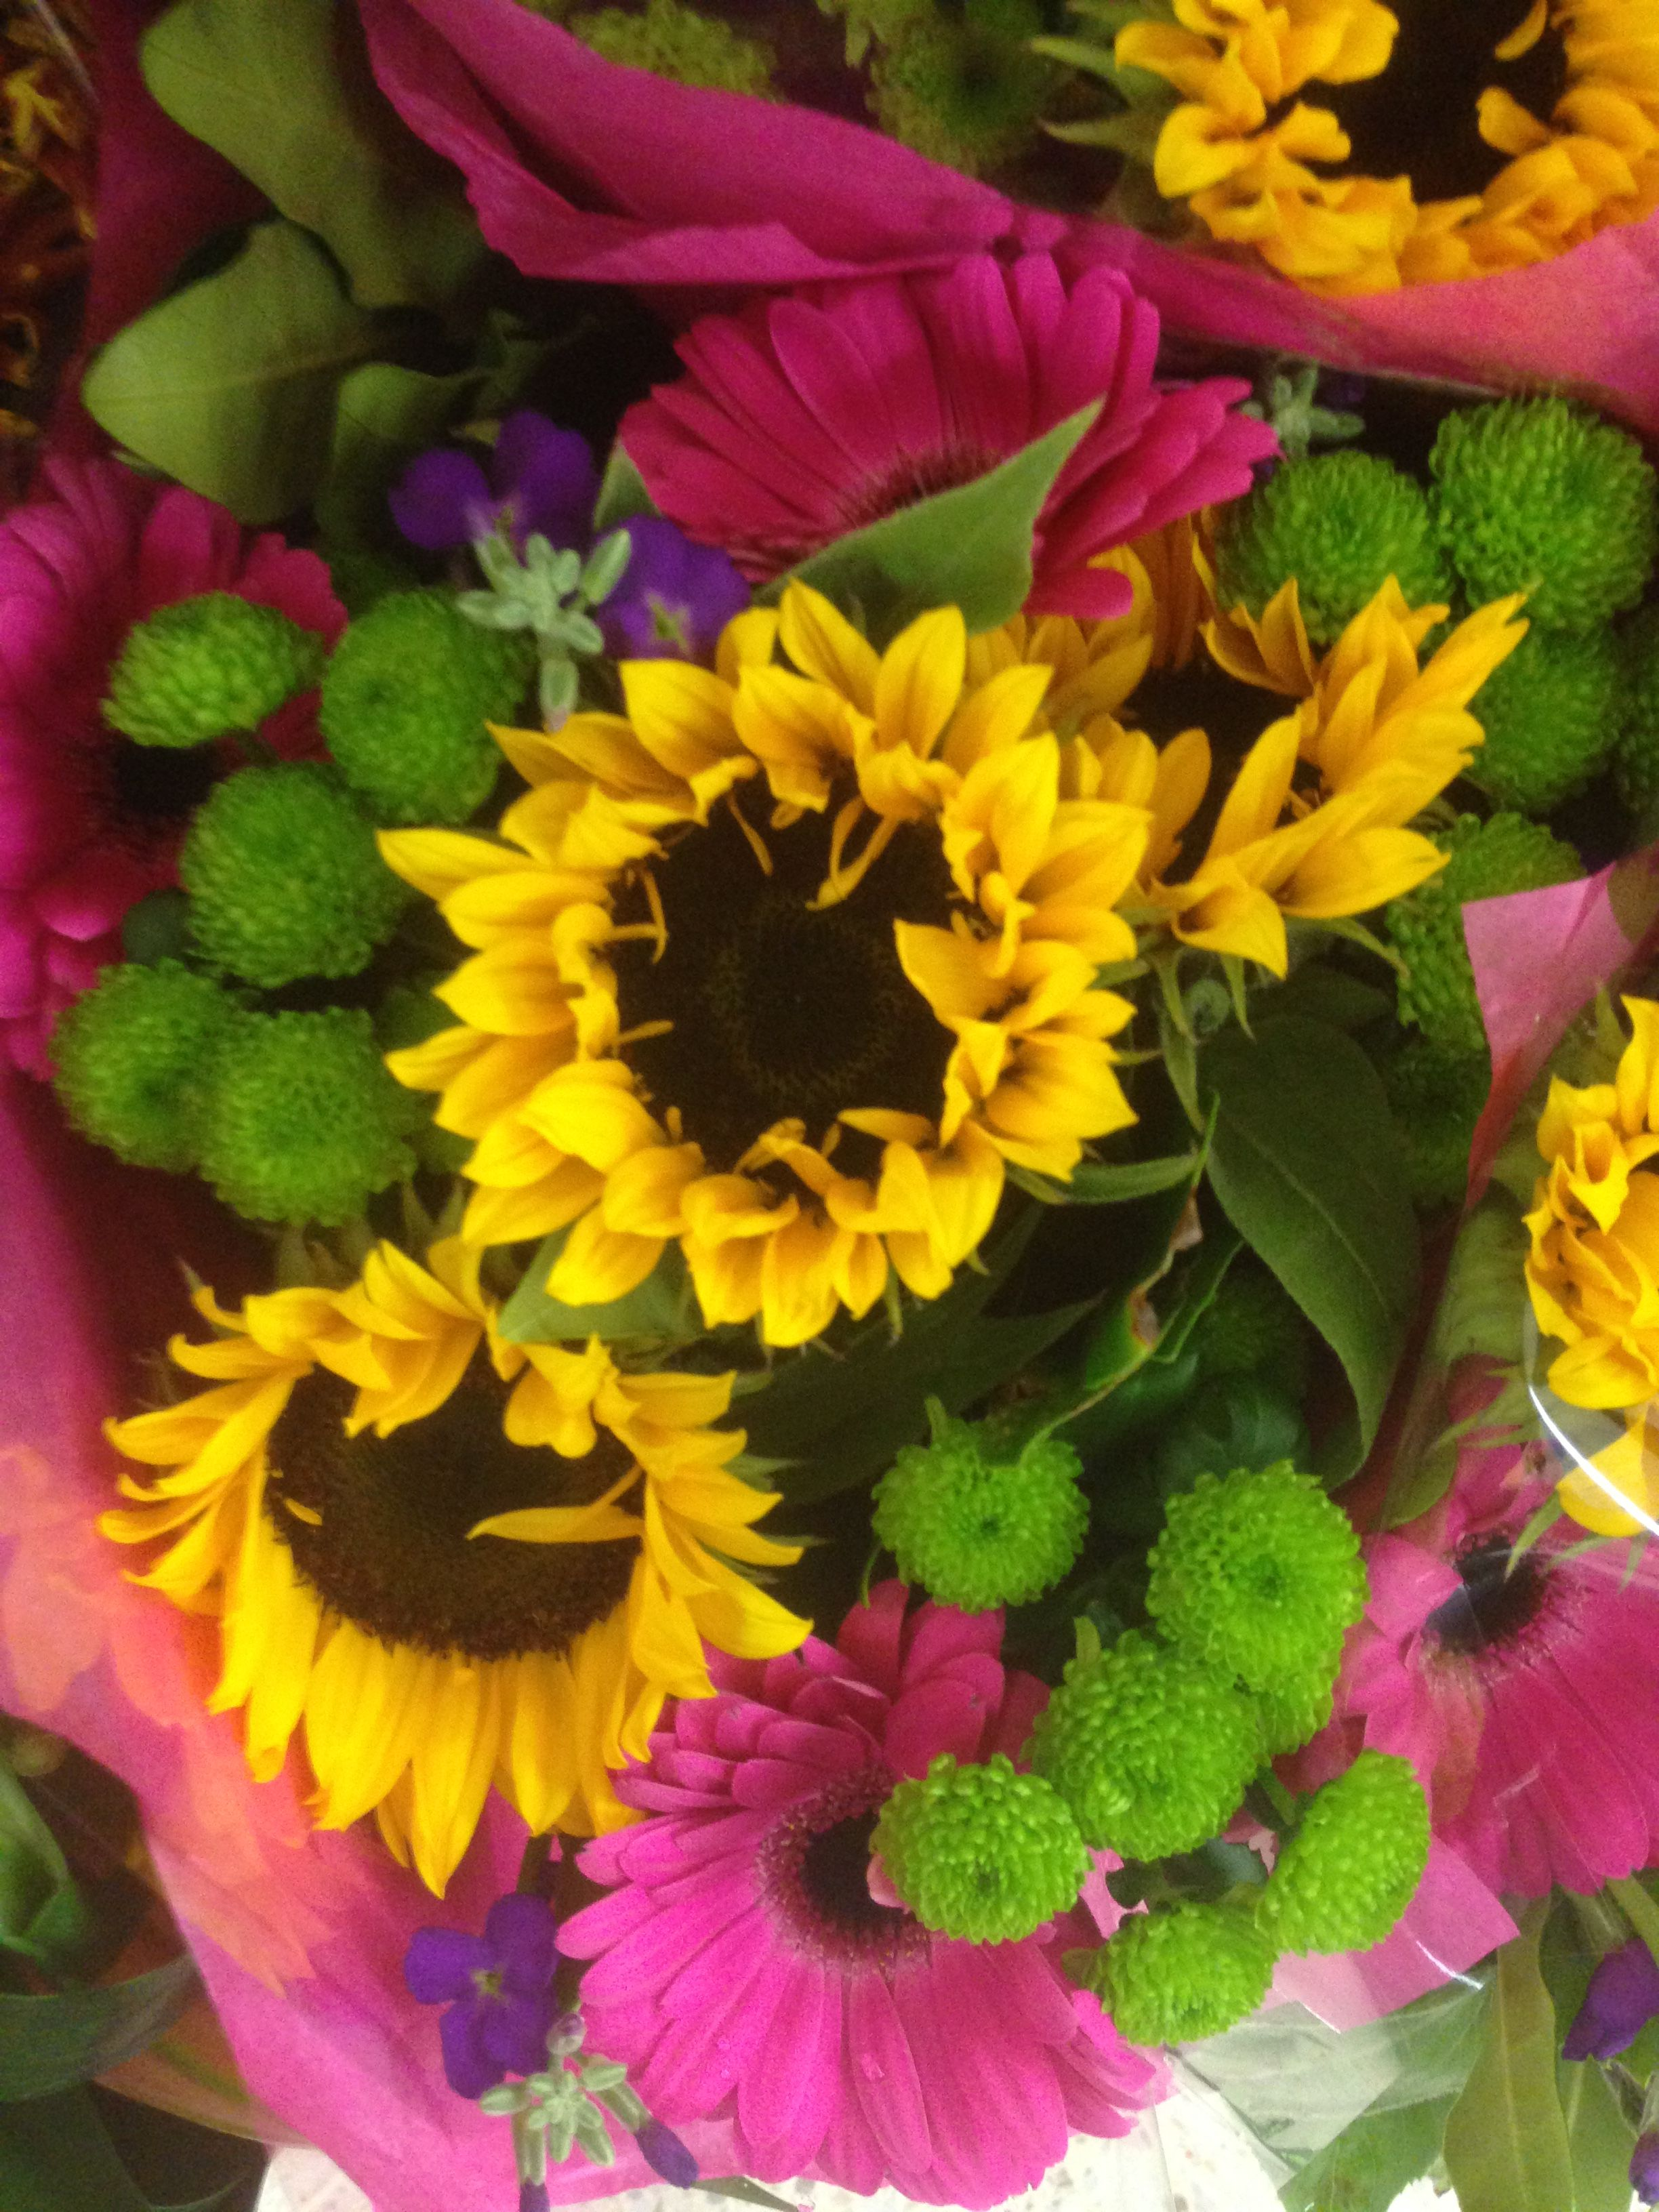 Treidforfree Tesco Fresh Cut Flowers Wonderful Flower For My Wife